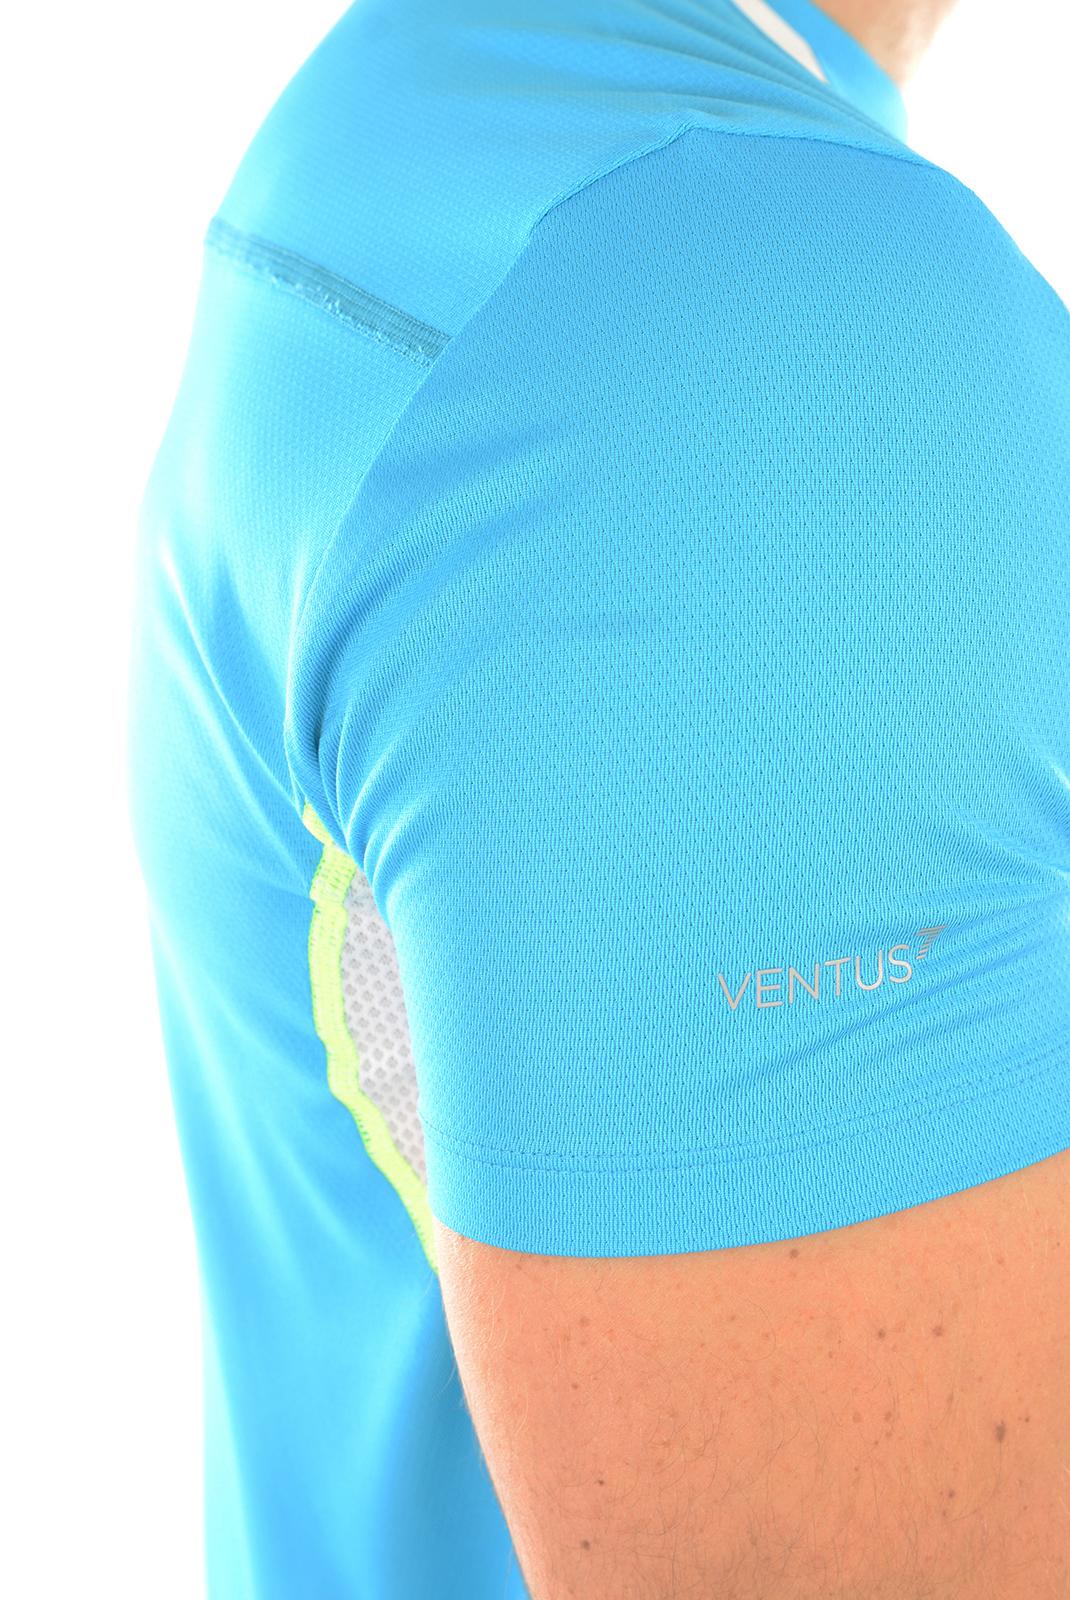 Tee-shirts manches courtes  Emporio armani 273972 6P667 BLUE 00032